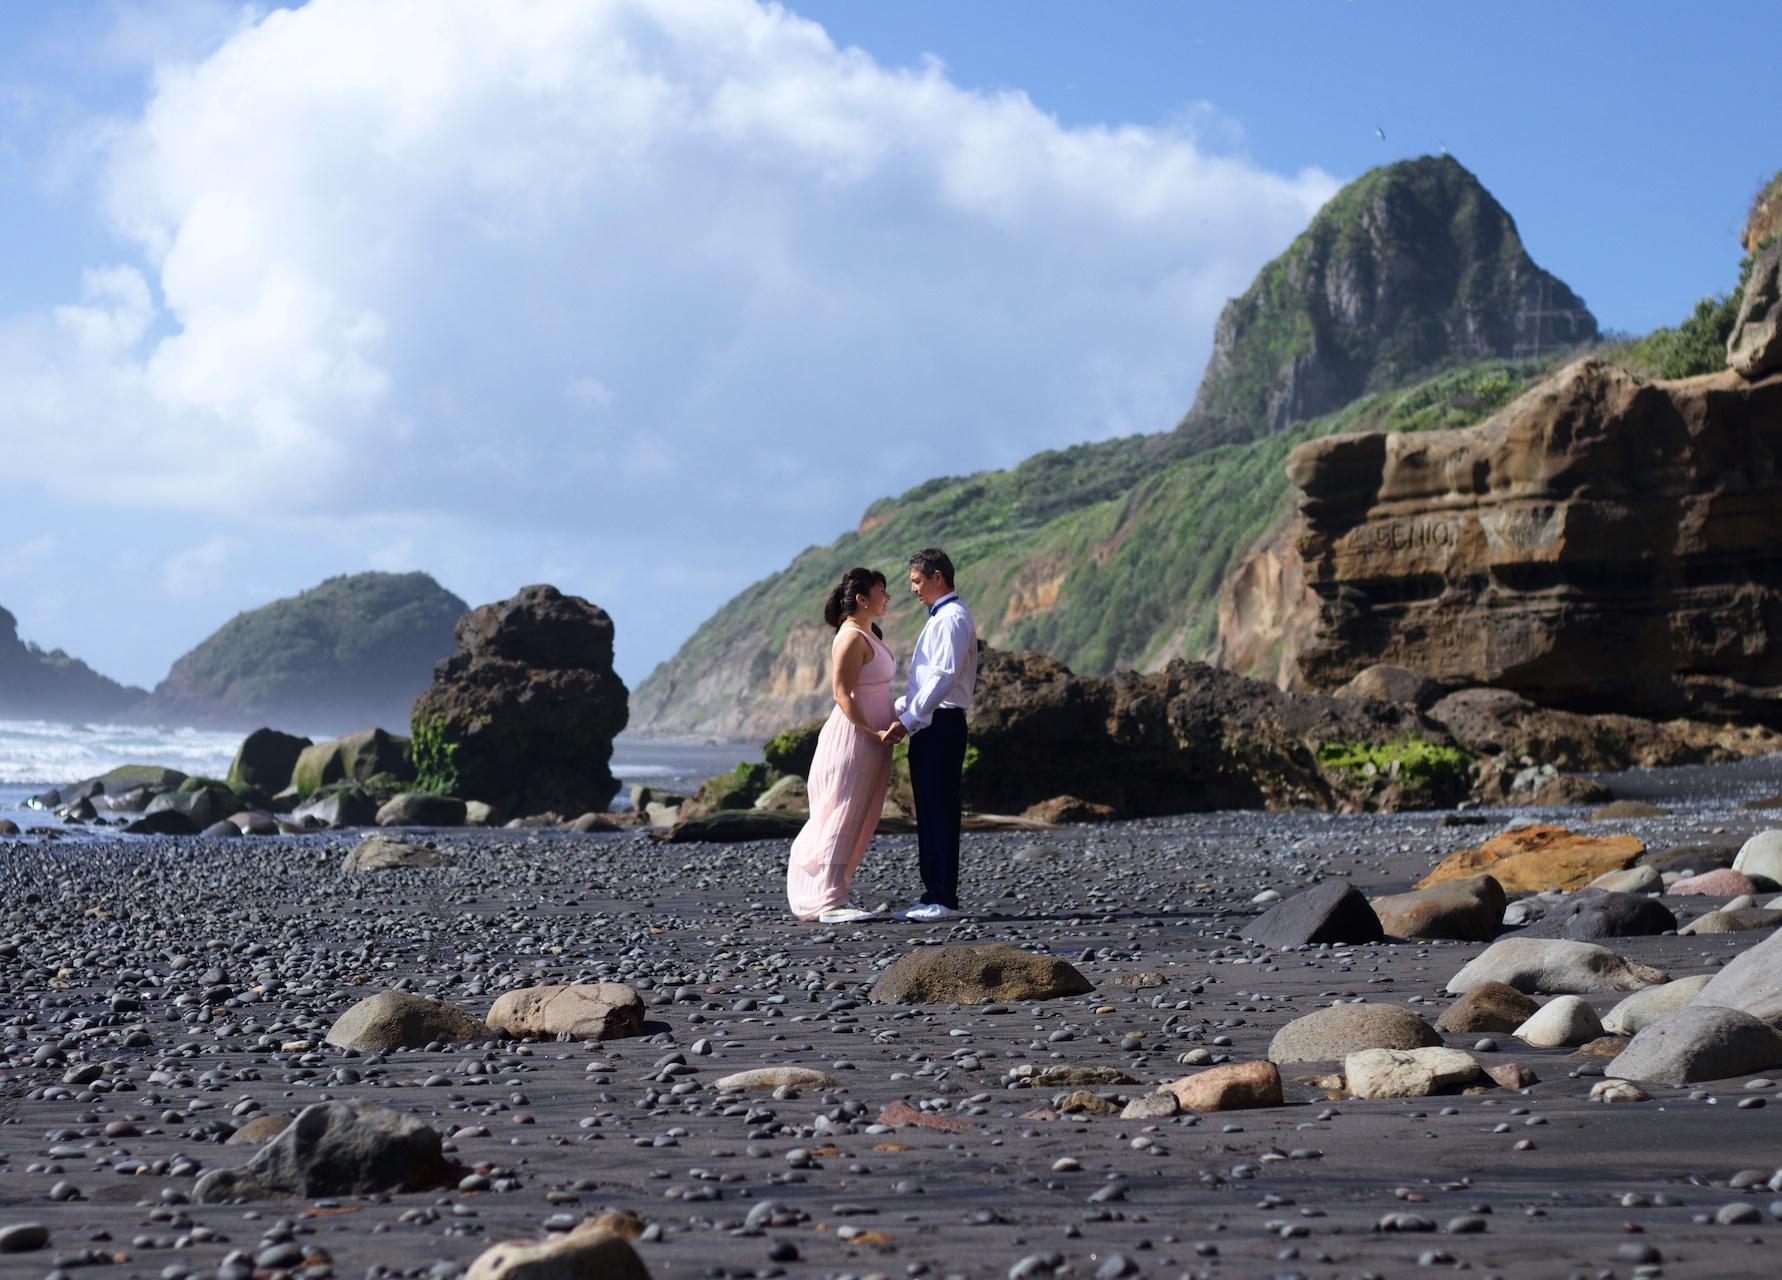 Wedding-video-nz.jpg